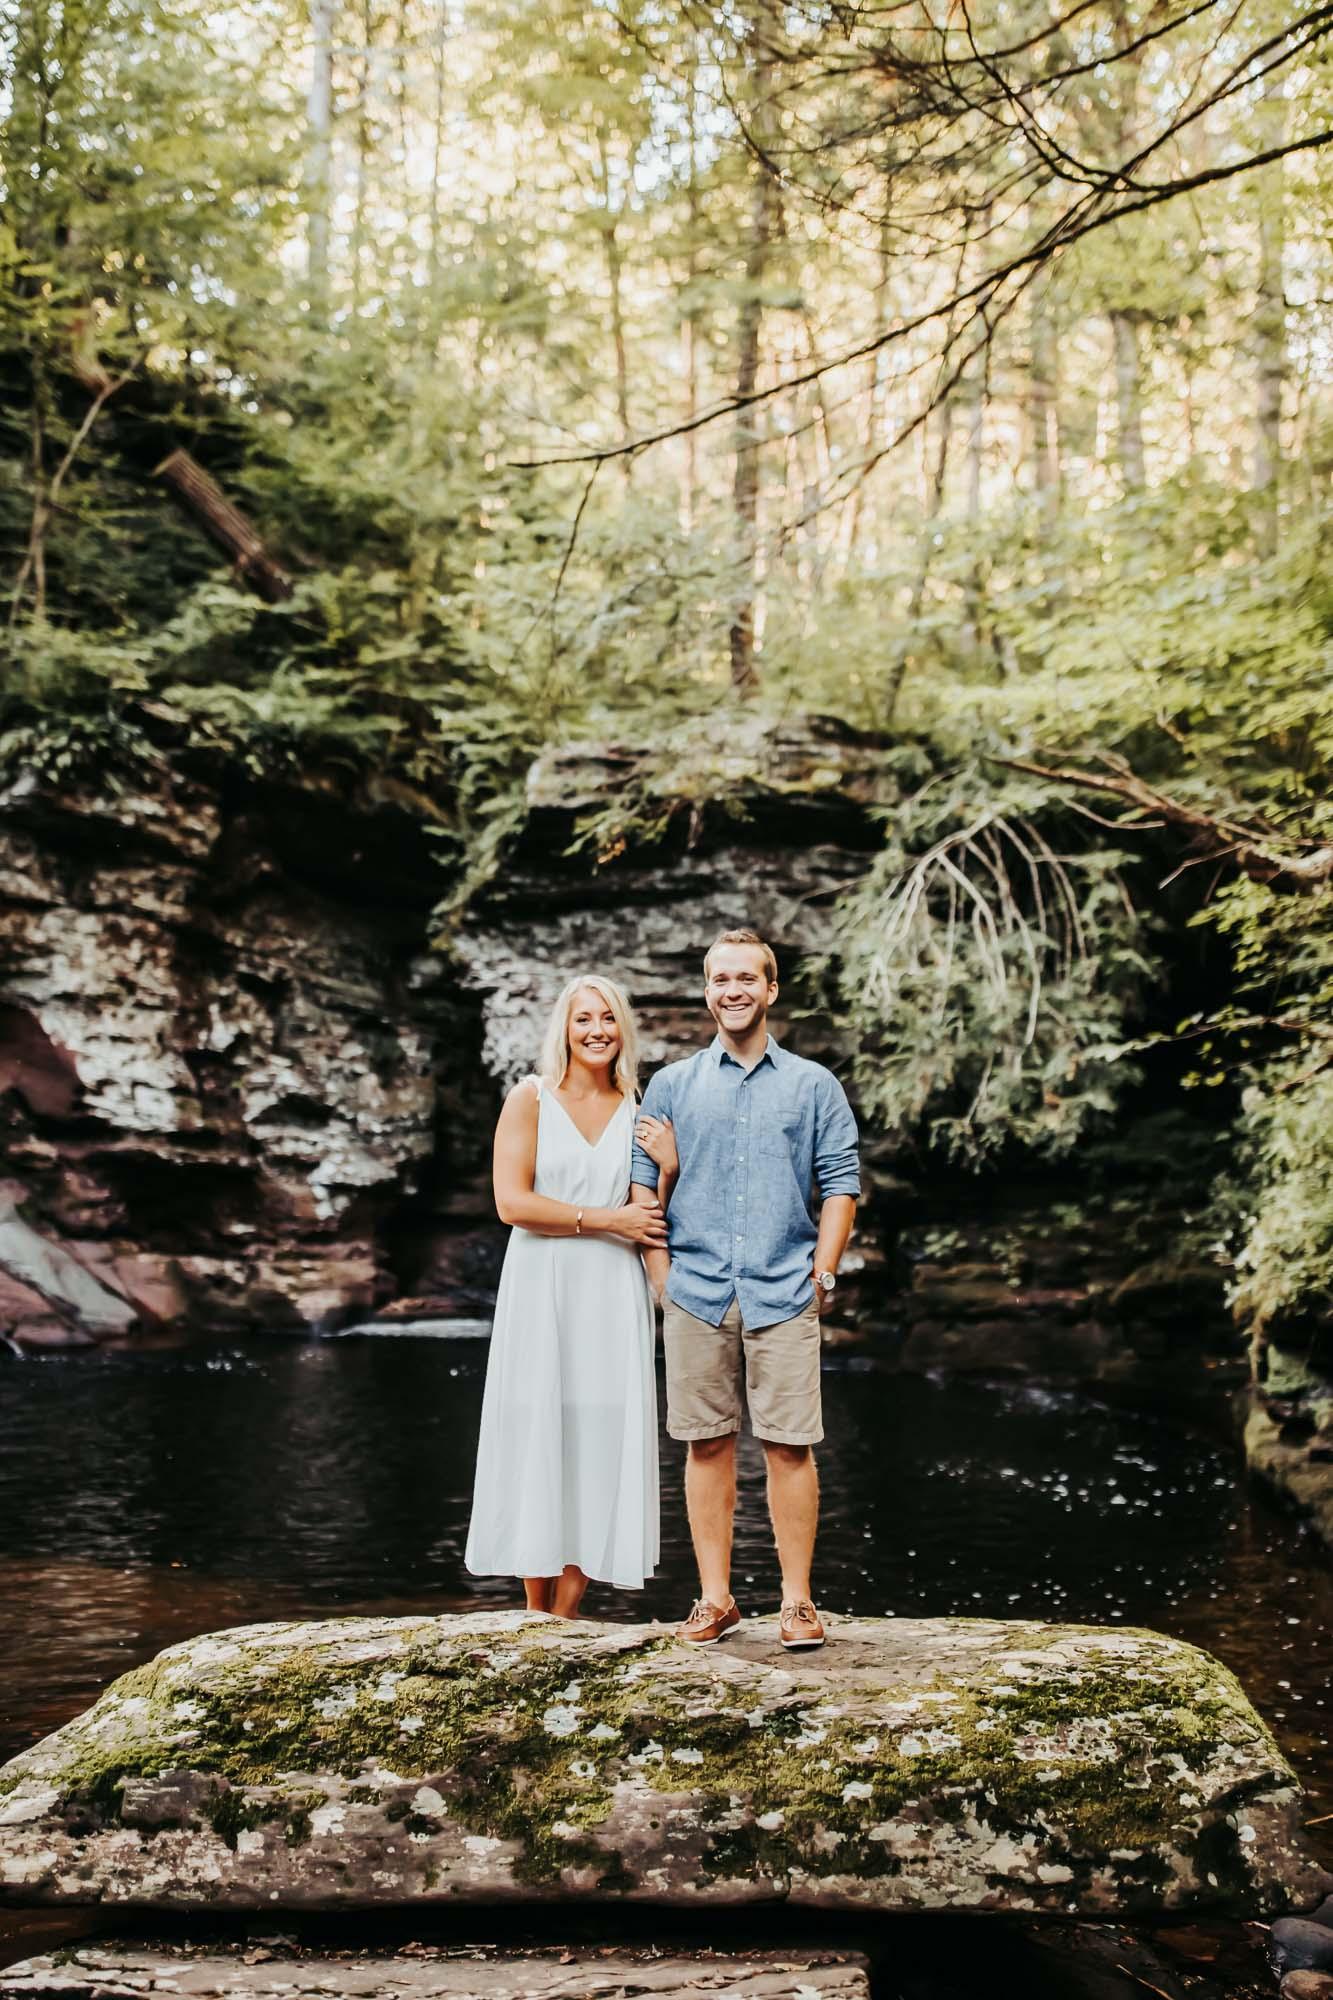 Ricketts-Glen-fall-engagement-photos-2599.jpg